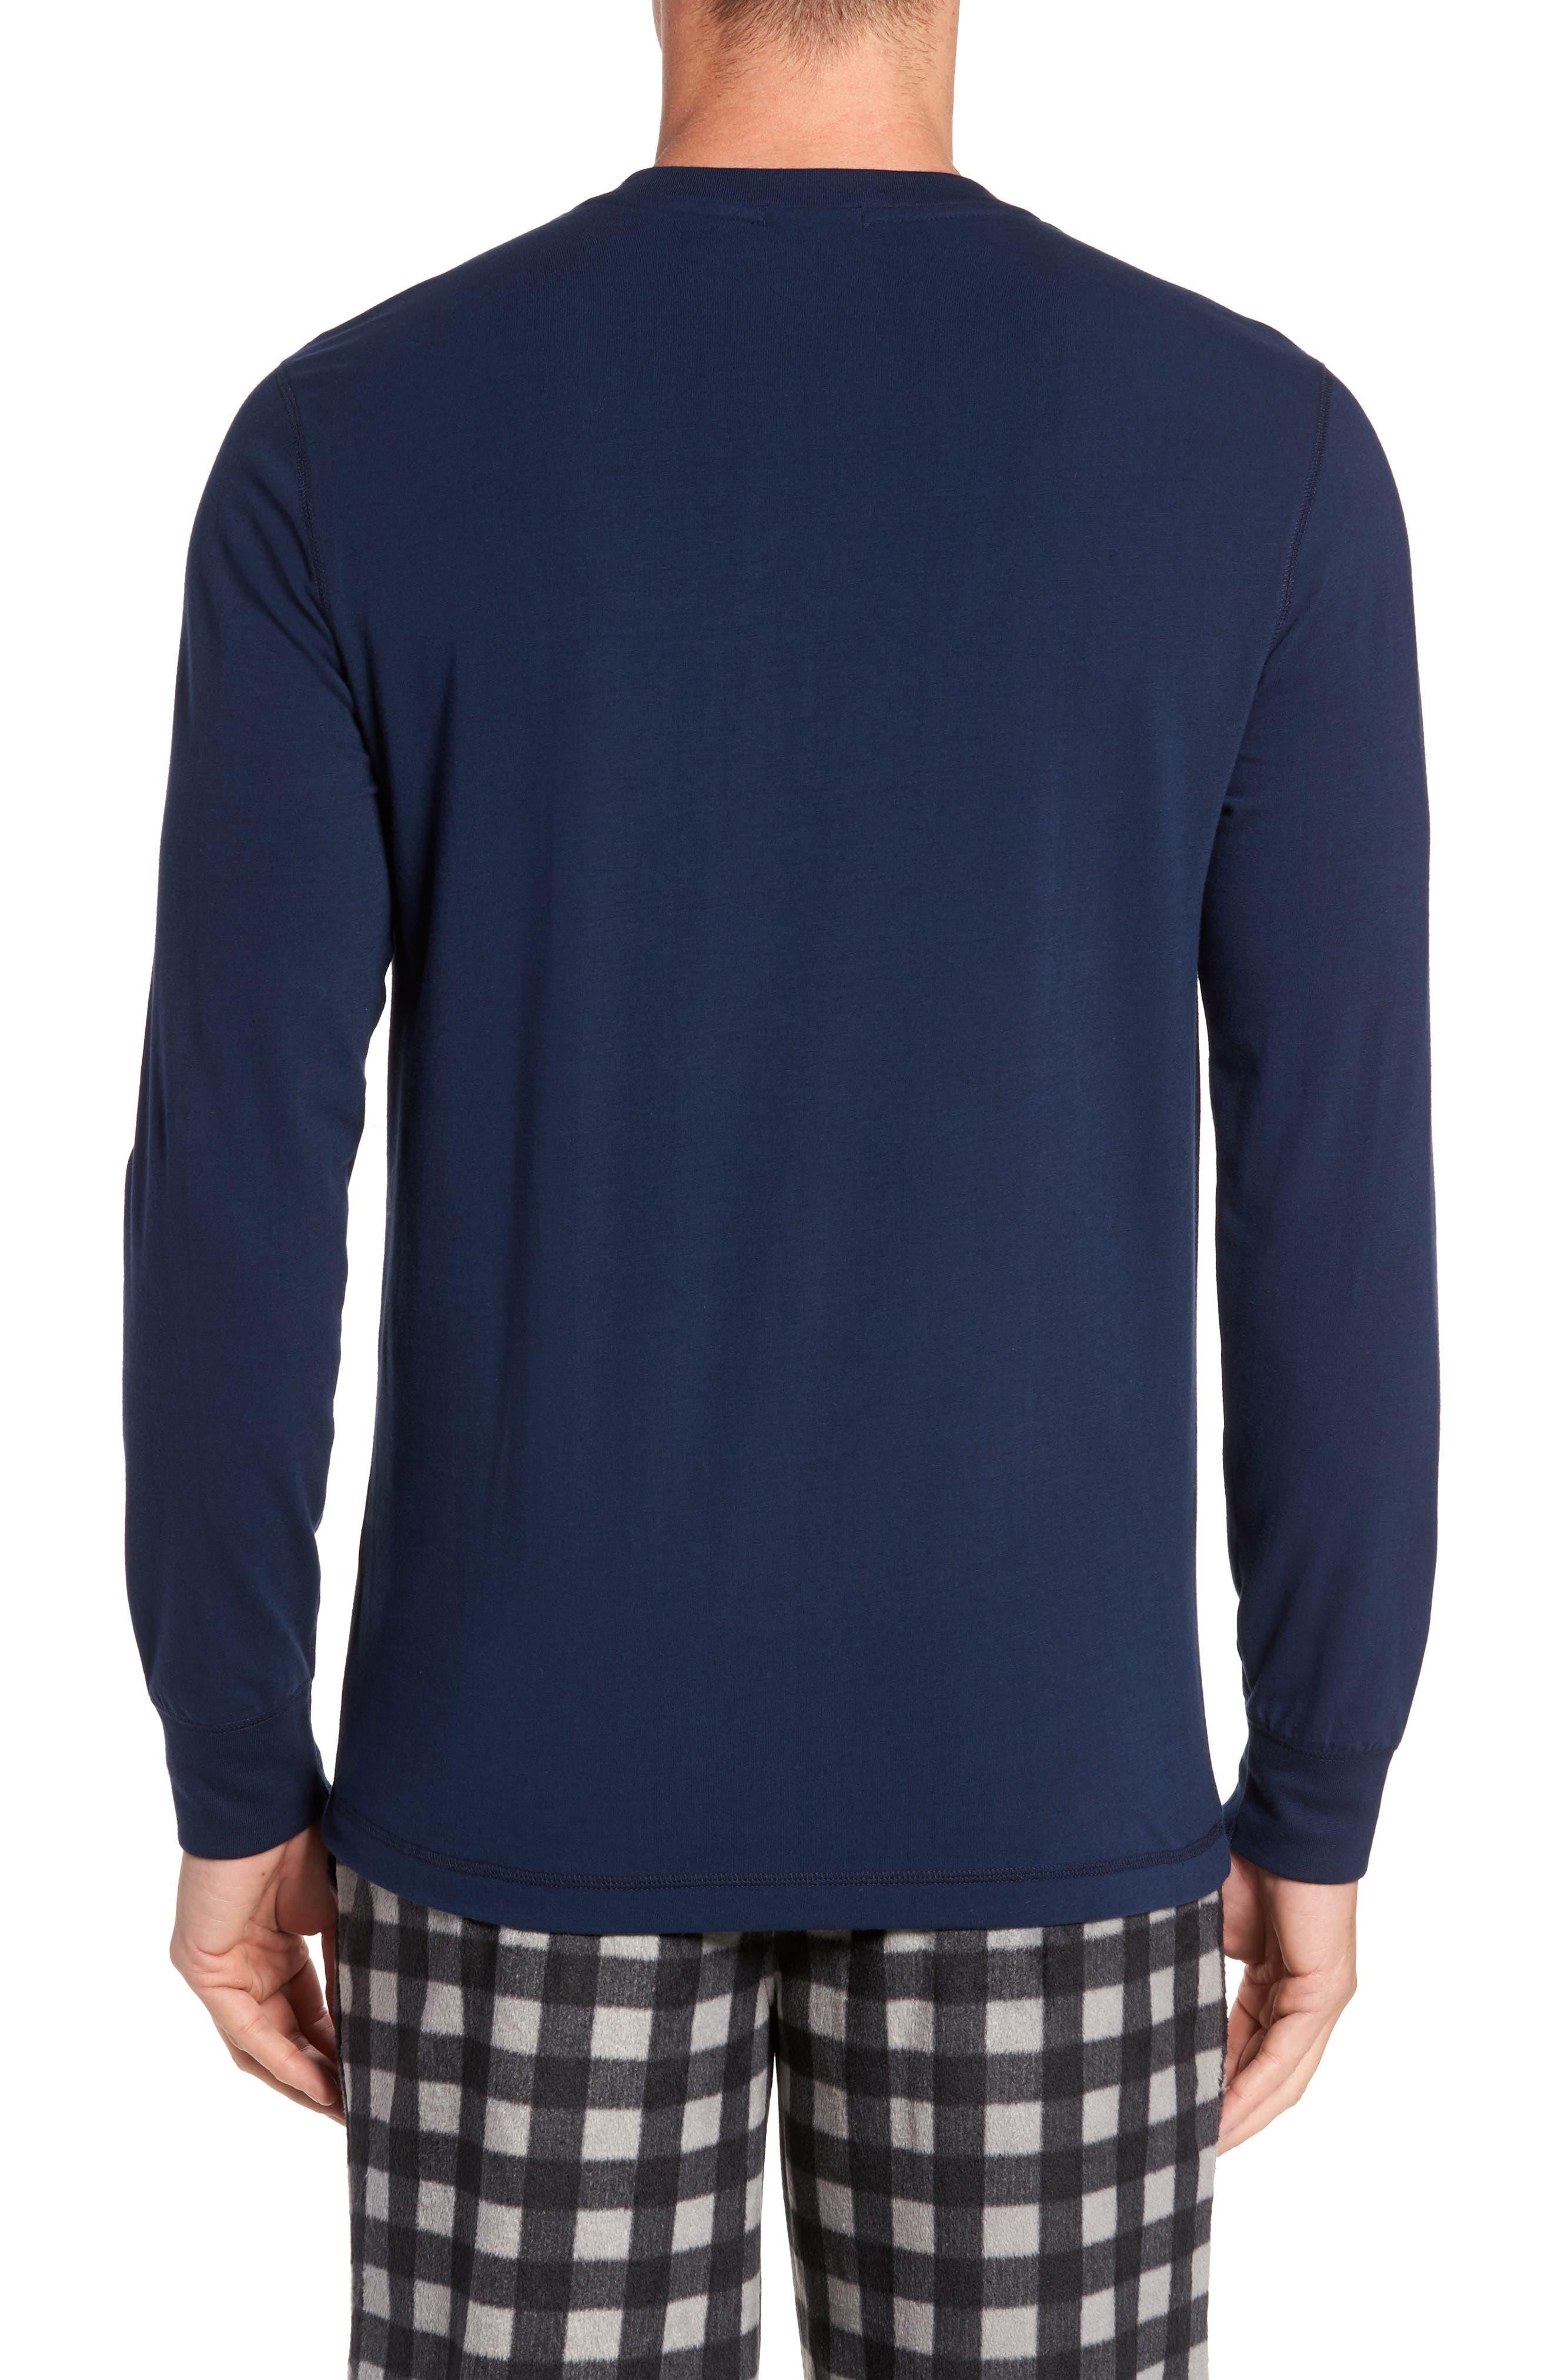 Alternate Image 2  - Nordstrom Men's Shop Stretch Cotton Long Sleeve T-Shirt